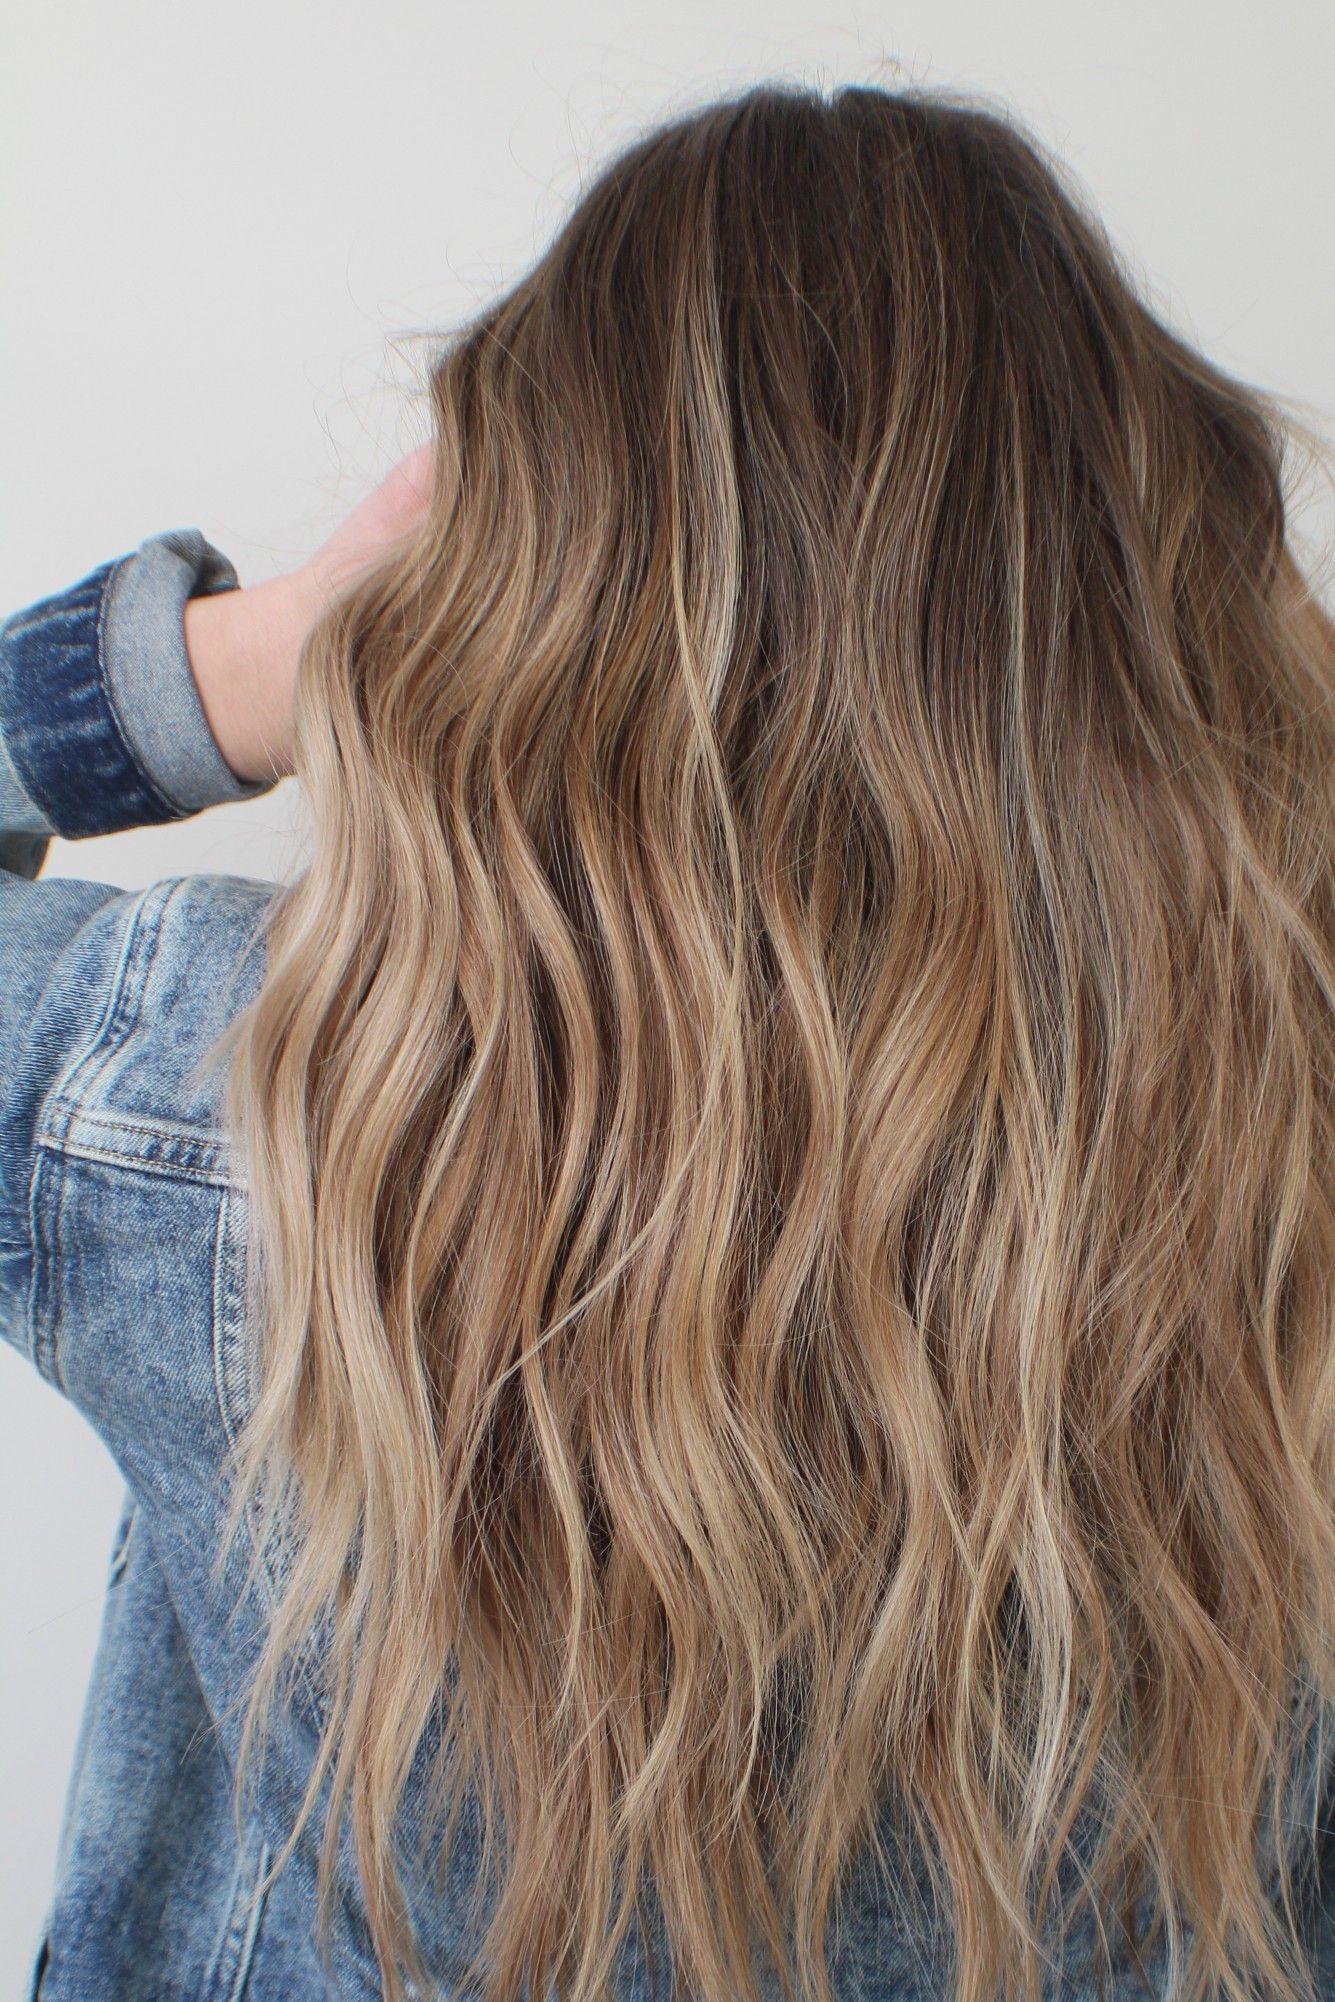 Brunette Balayage Caramel Highlights Beach Waves Haare Balayage Balayage Frisur Coole Frisuren